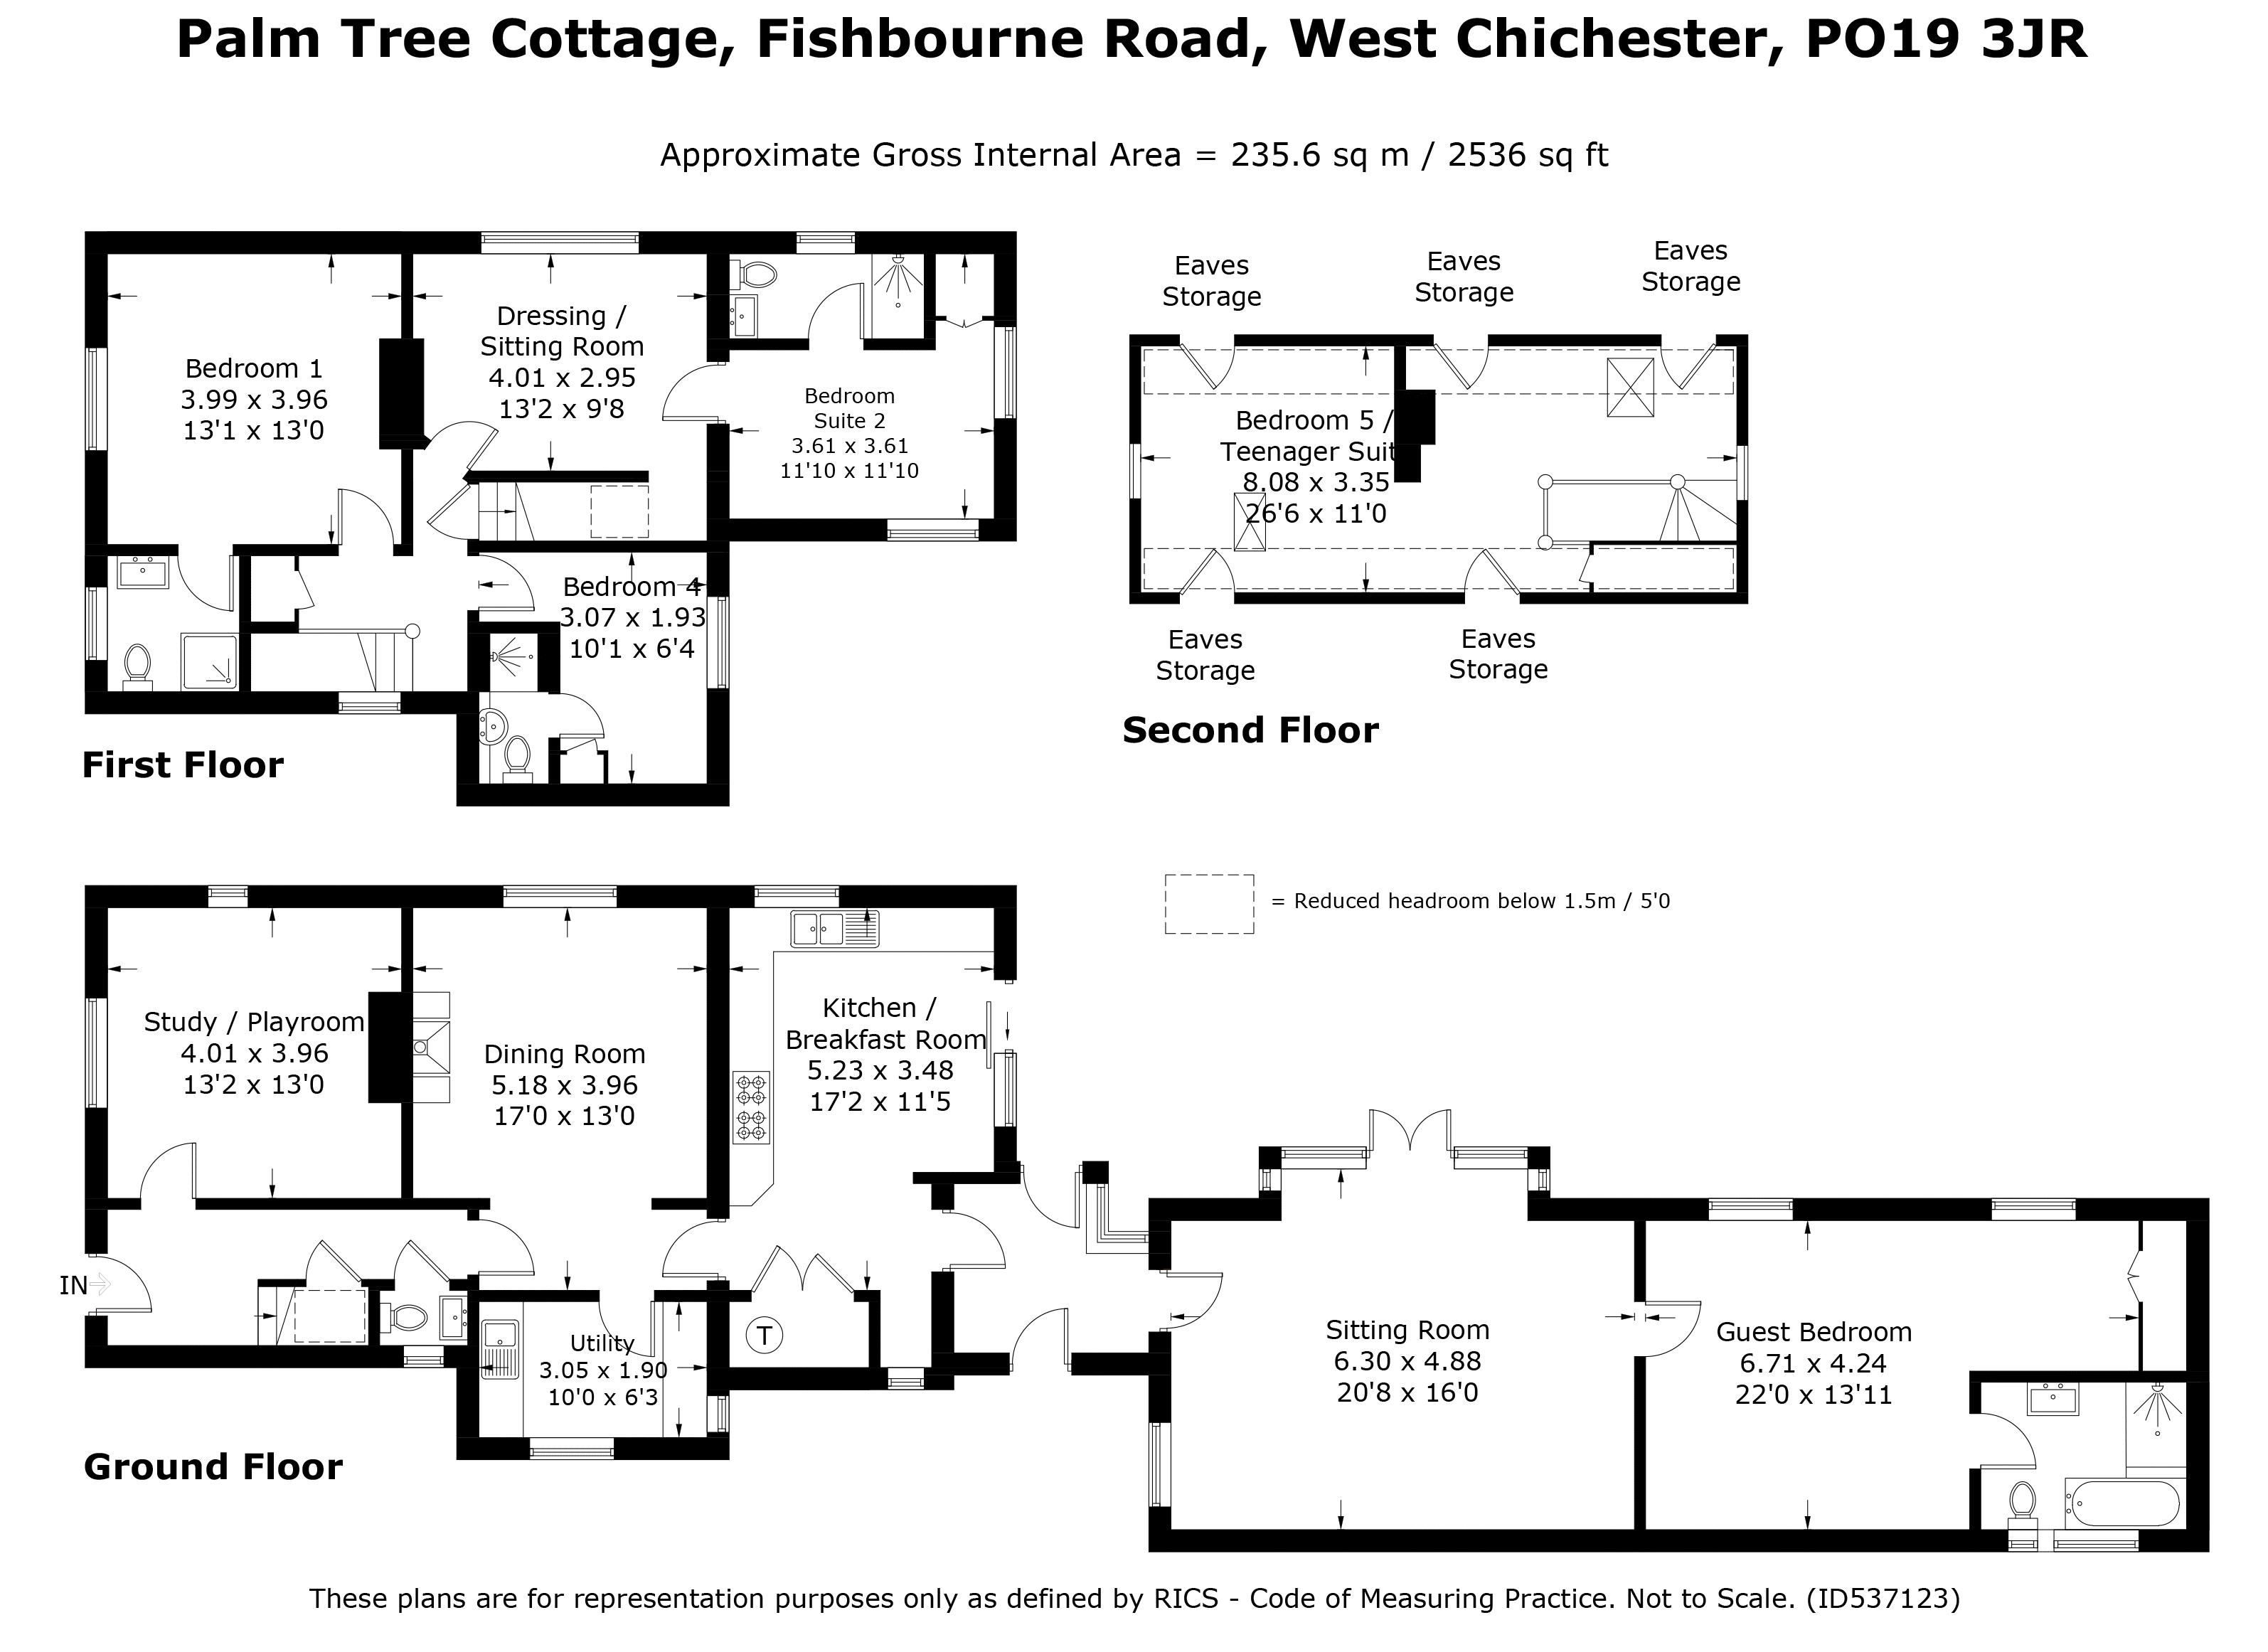 Fishbourne Road West Fishbourne